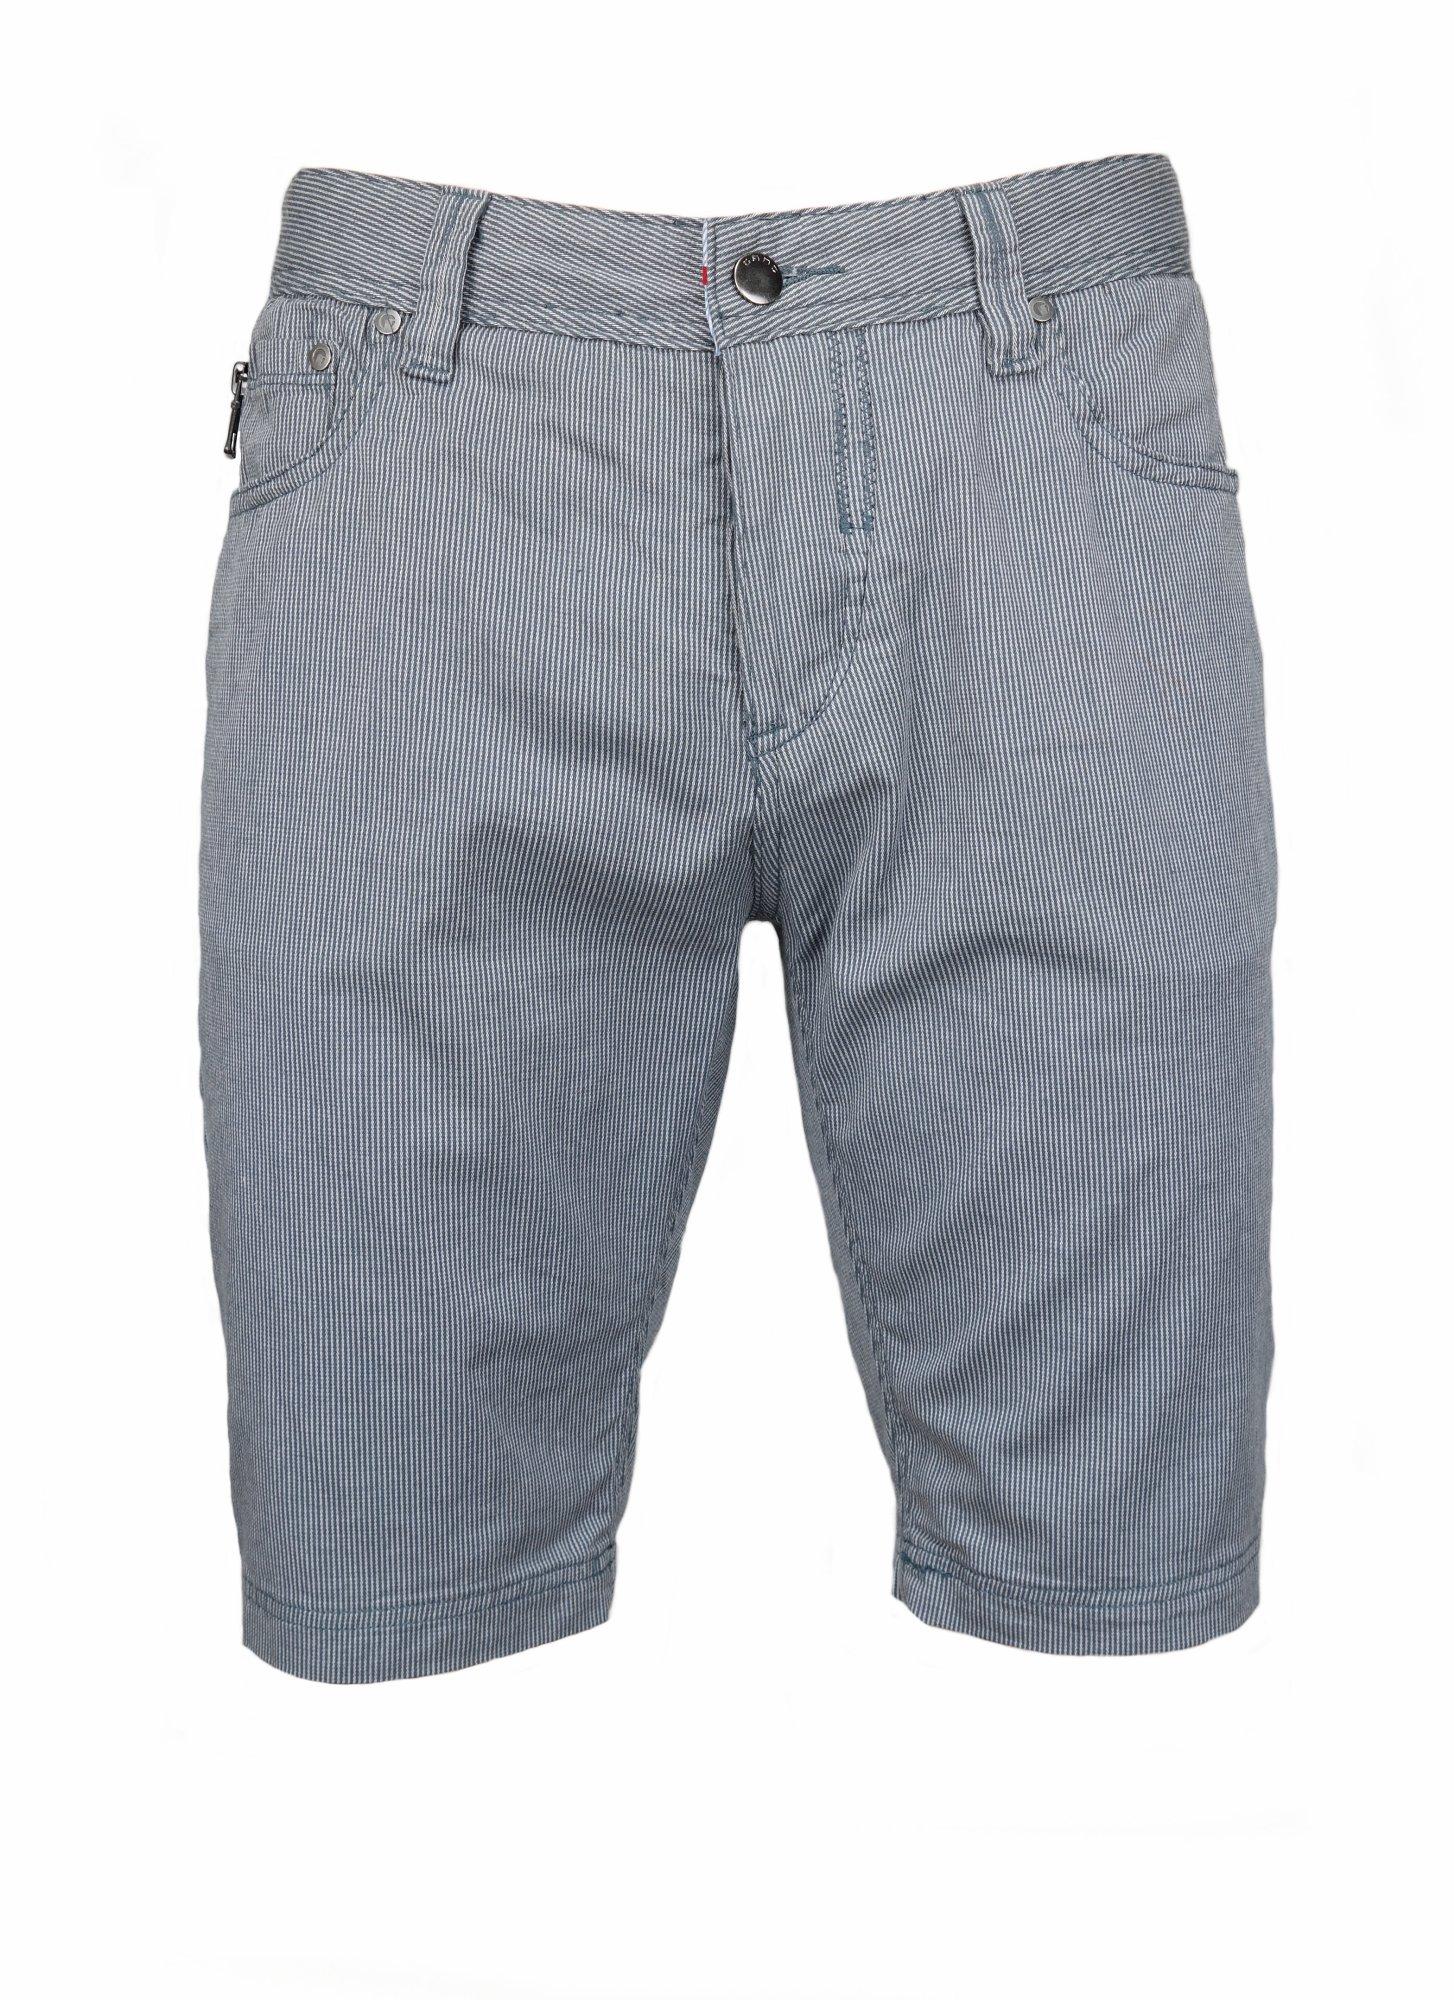 Gang JIM Herren Short / Bermuda kurze Hose / Streifen Design / Baumwolle